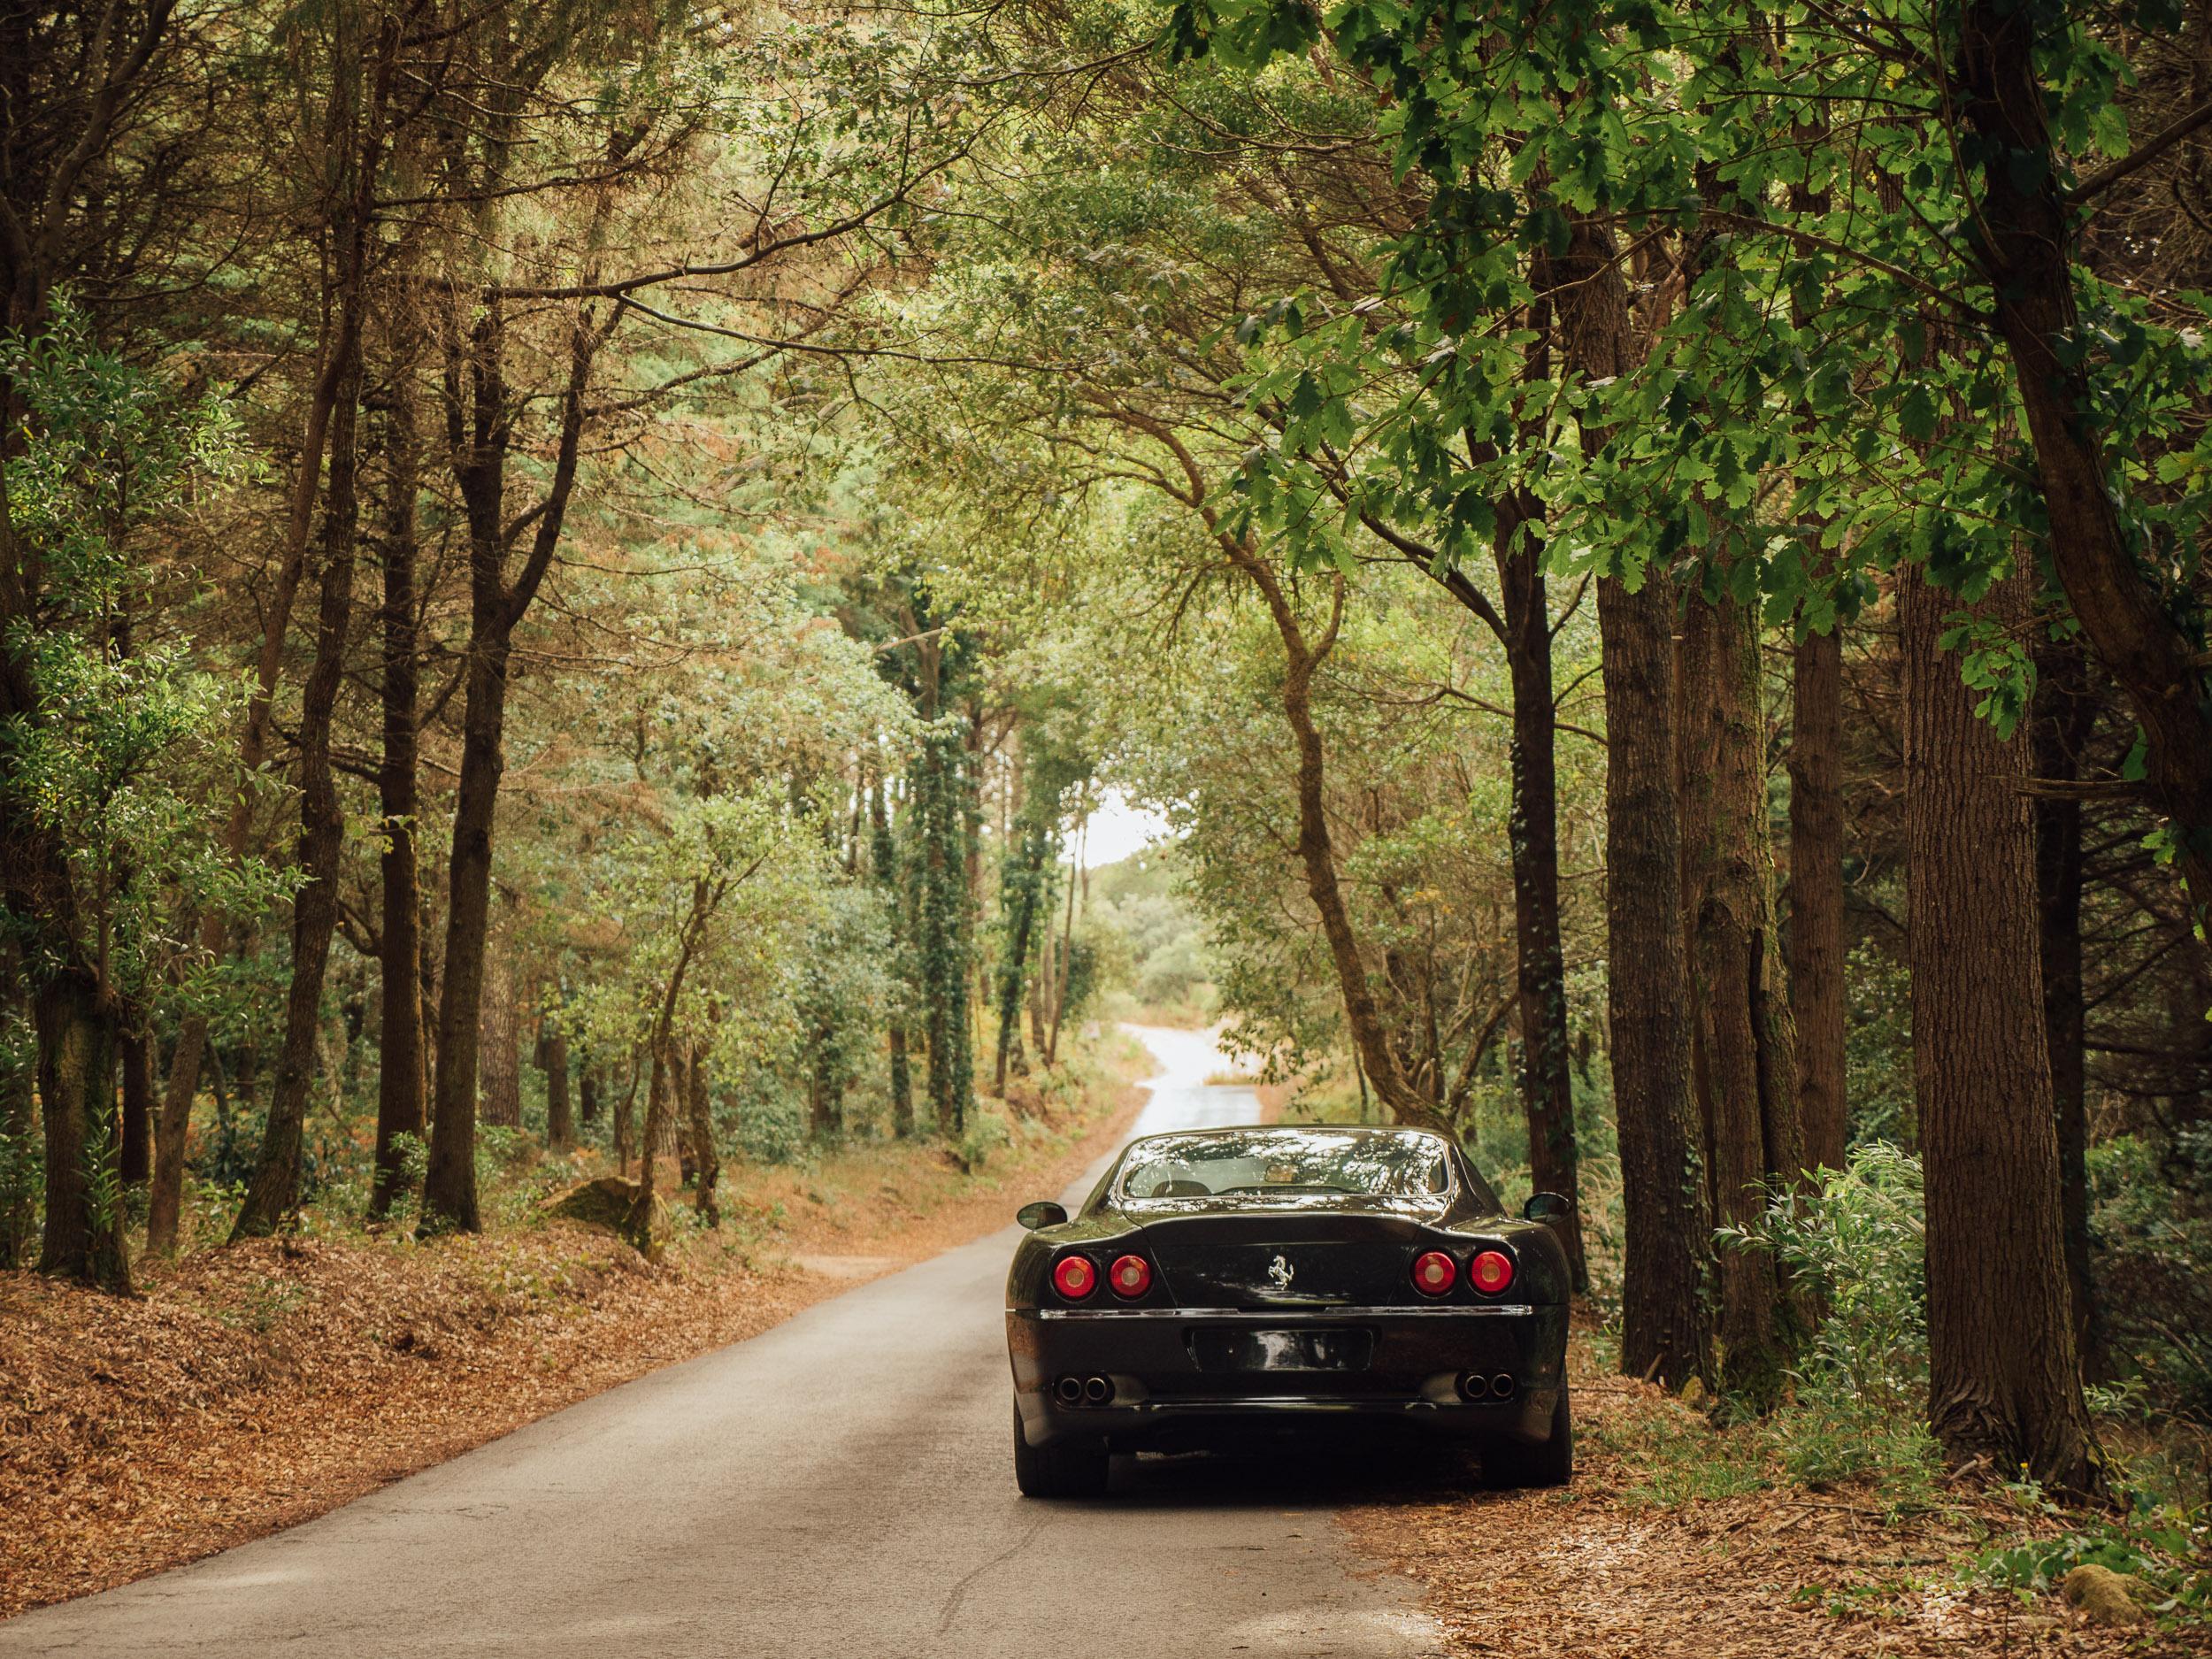 Ferrari_Maranello (37 of 40).jpg